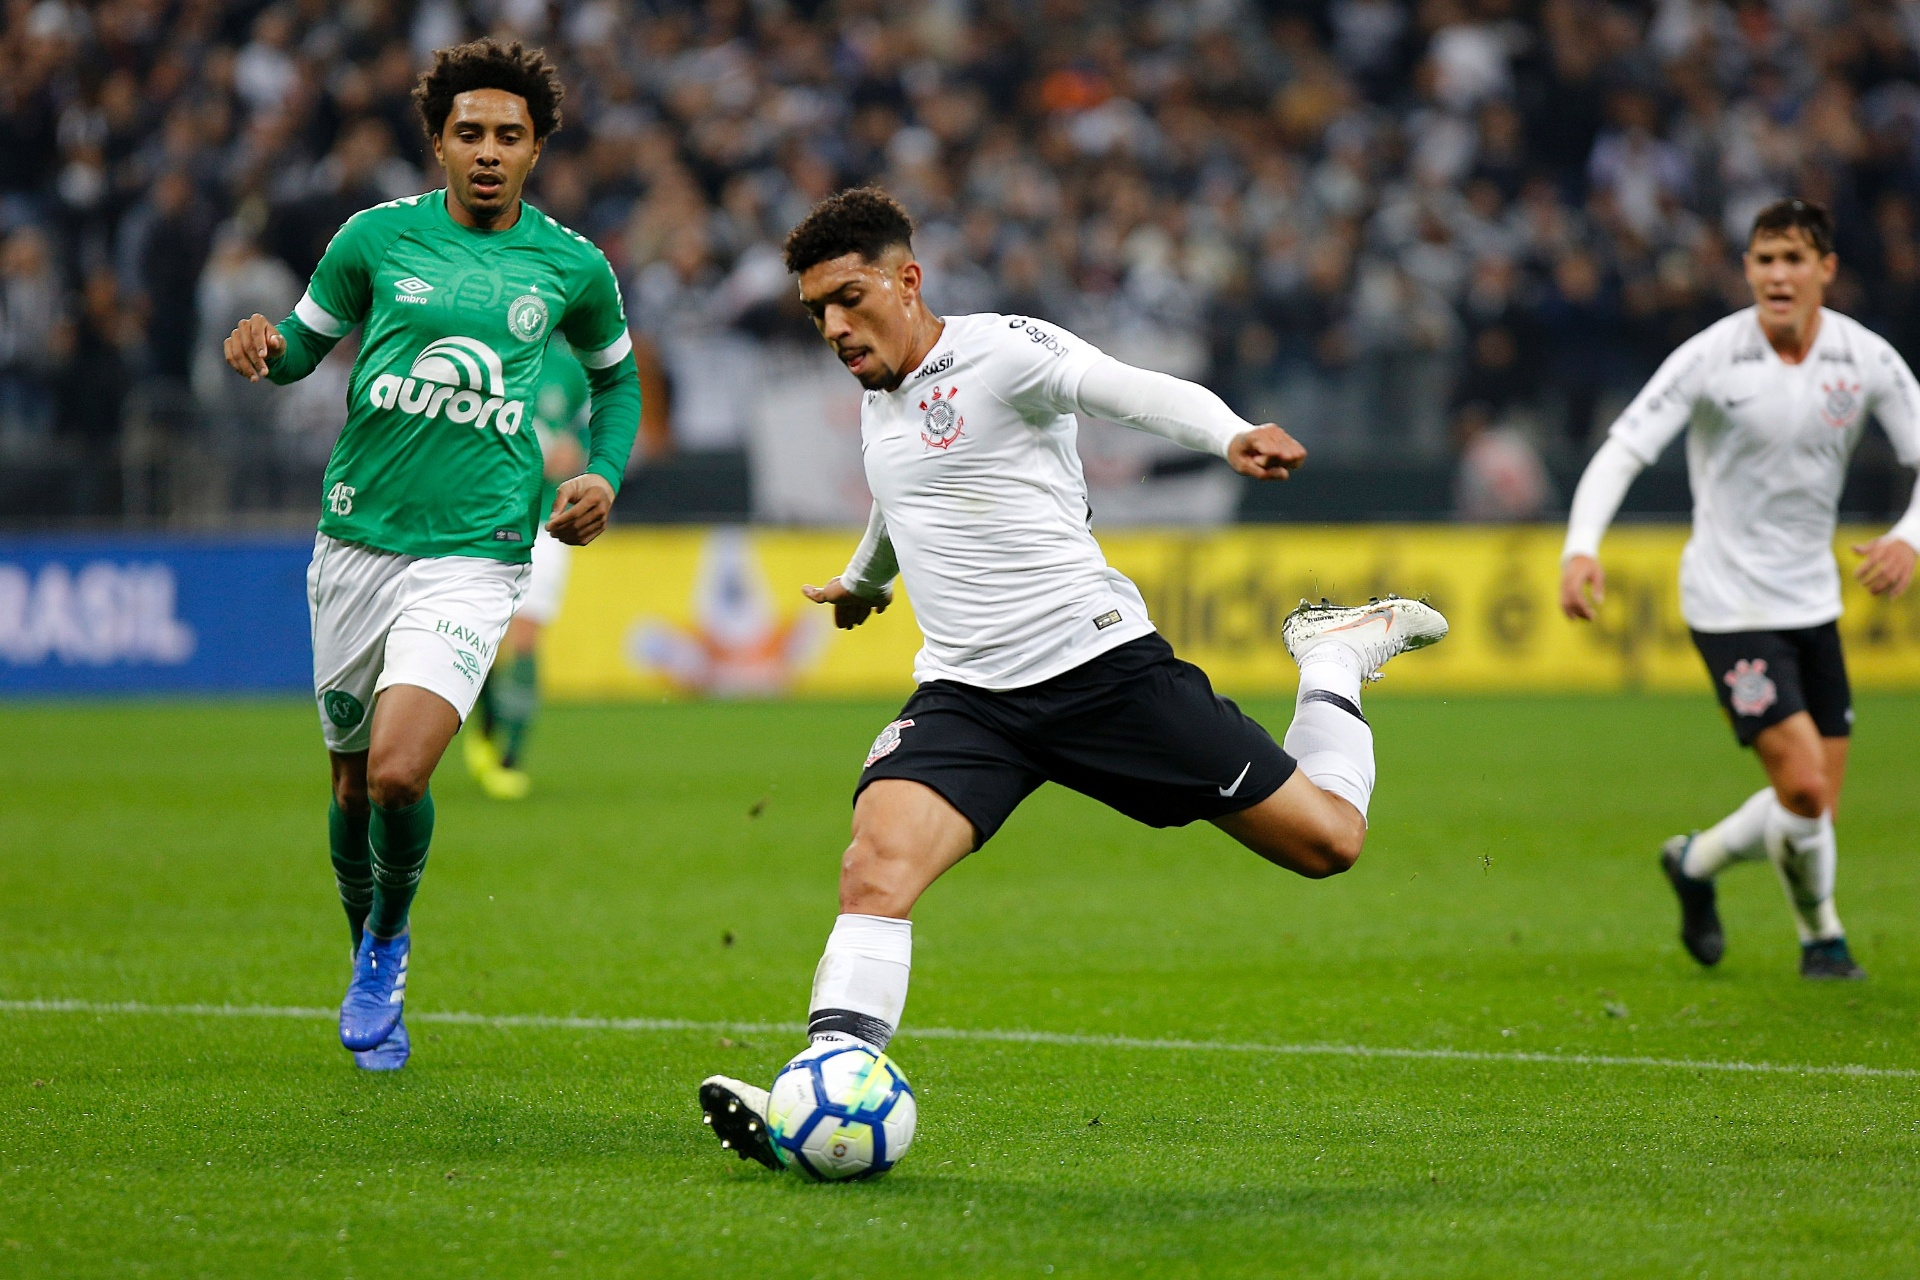 Corinthians tenta se adaptar a Douglas enquanto Maycon brilha na Champions  - 21 09 2018 - UOL Esporte be769d5c4cfe3